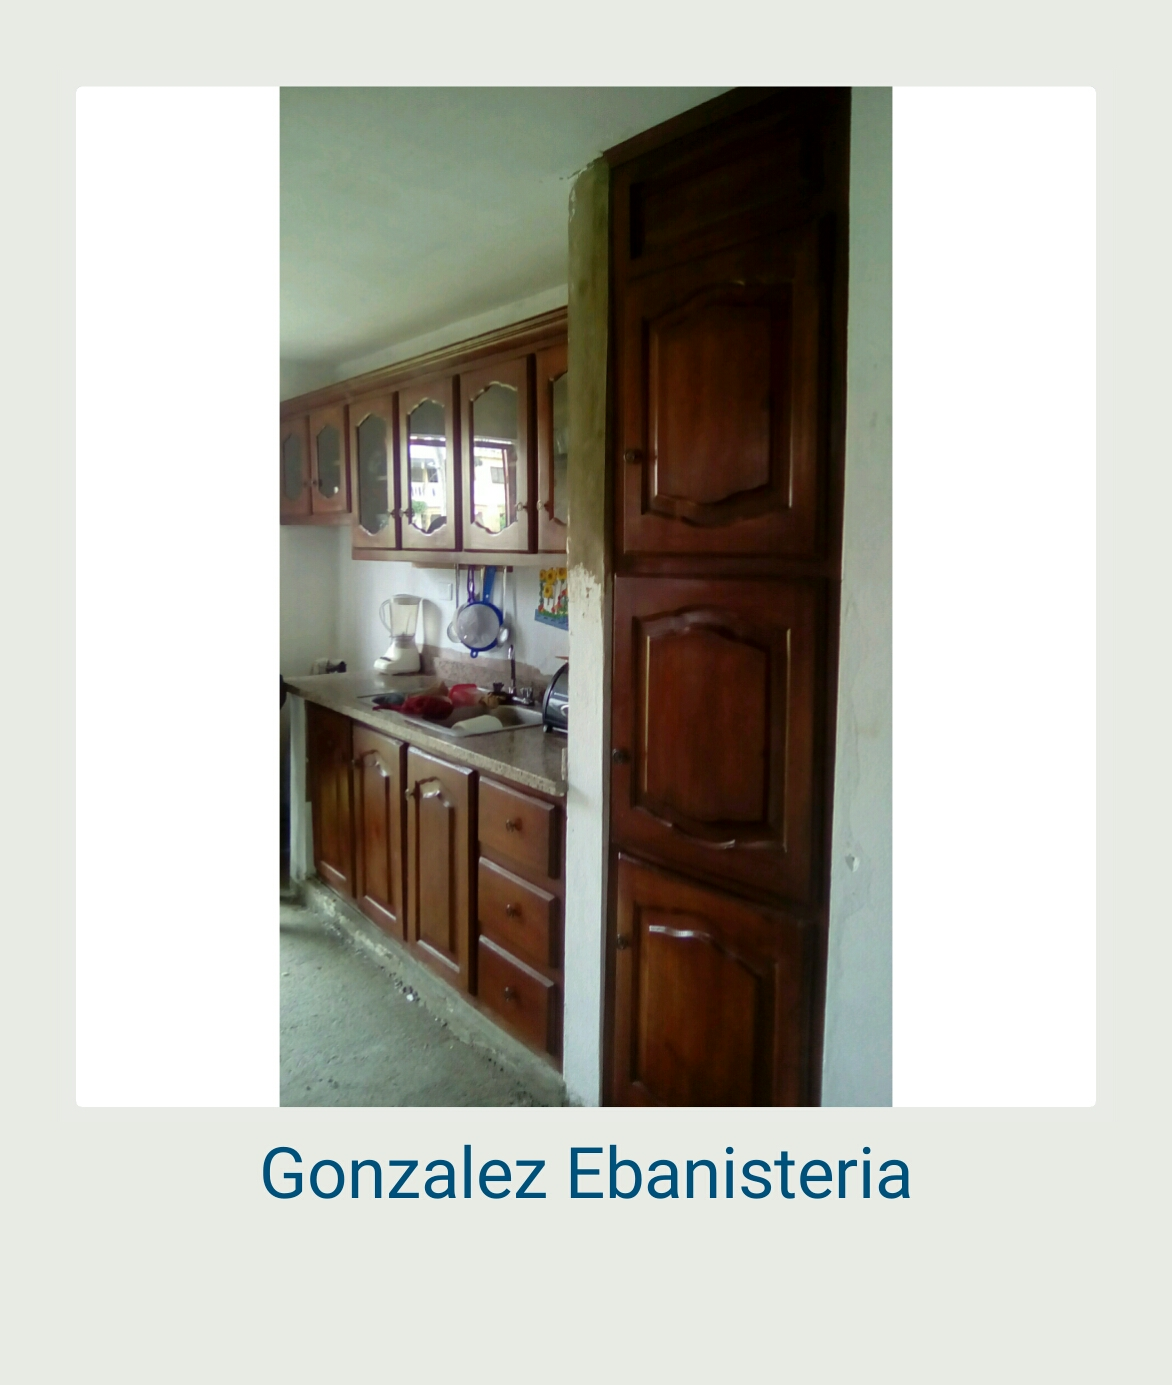 Diseño de cocina -45011 | clasificados.com.do